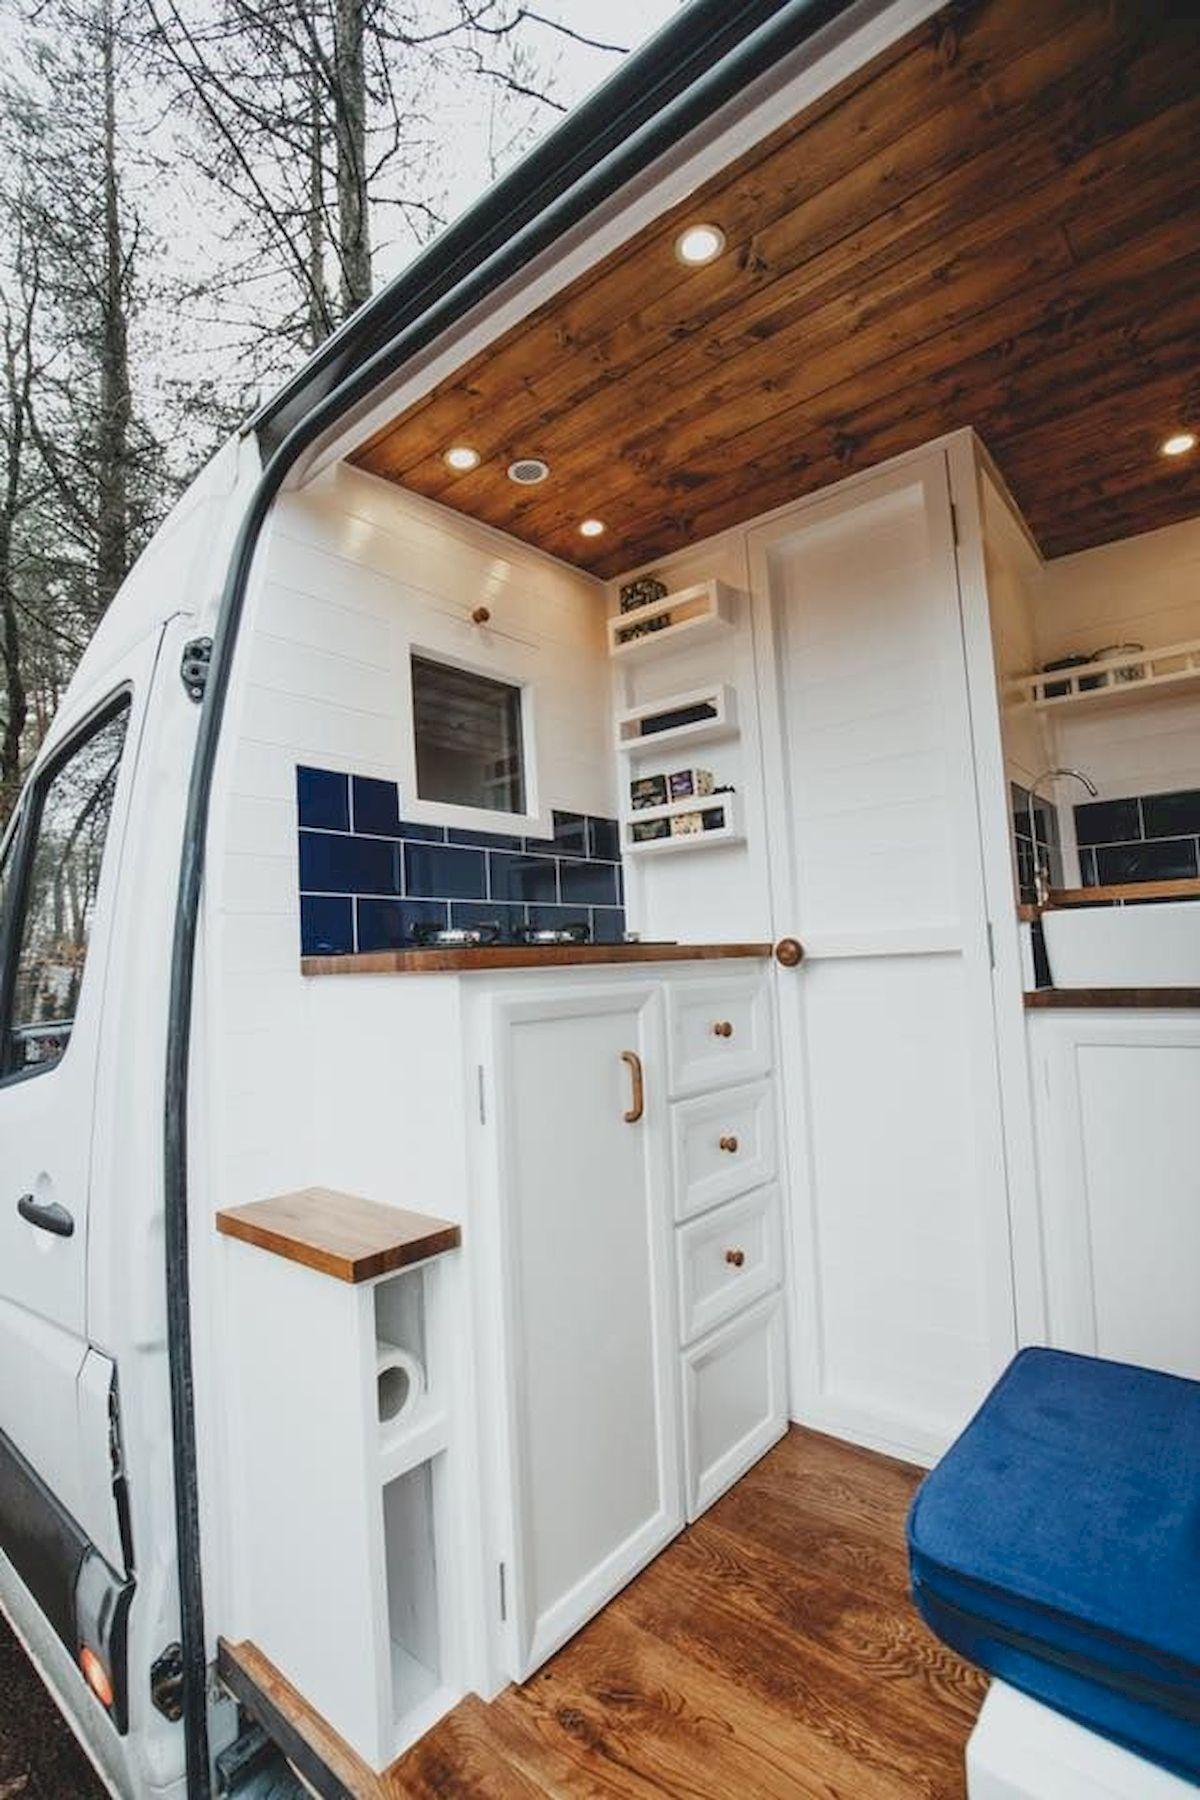 The Perfect Way Campervan Interior Design Ideas Yellowraises Motorhome Interior Van Conversion Interior Van Interior